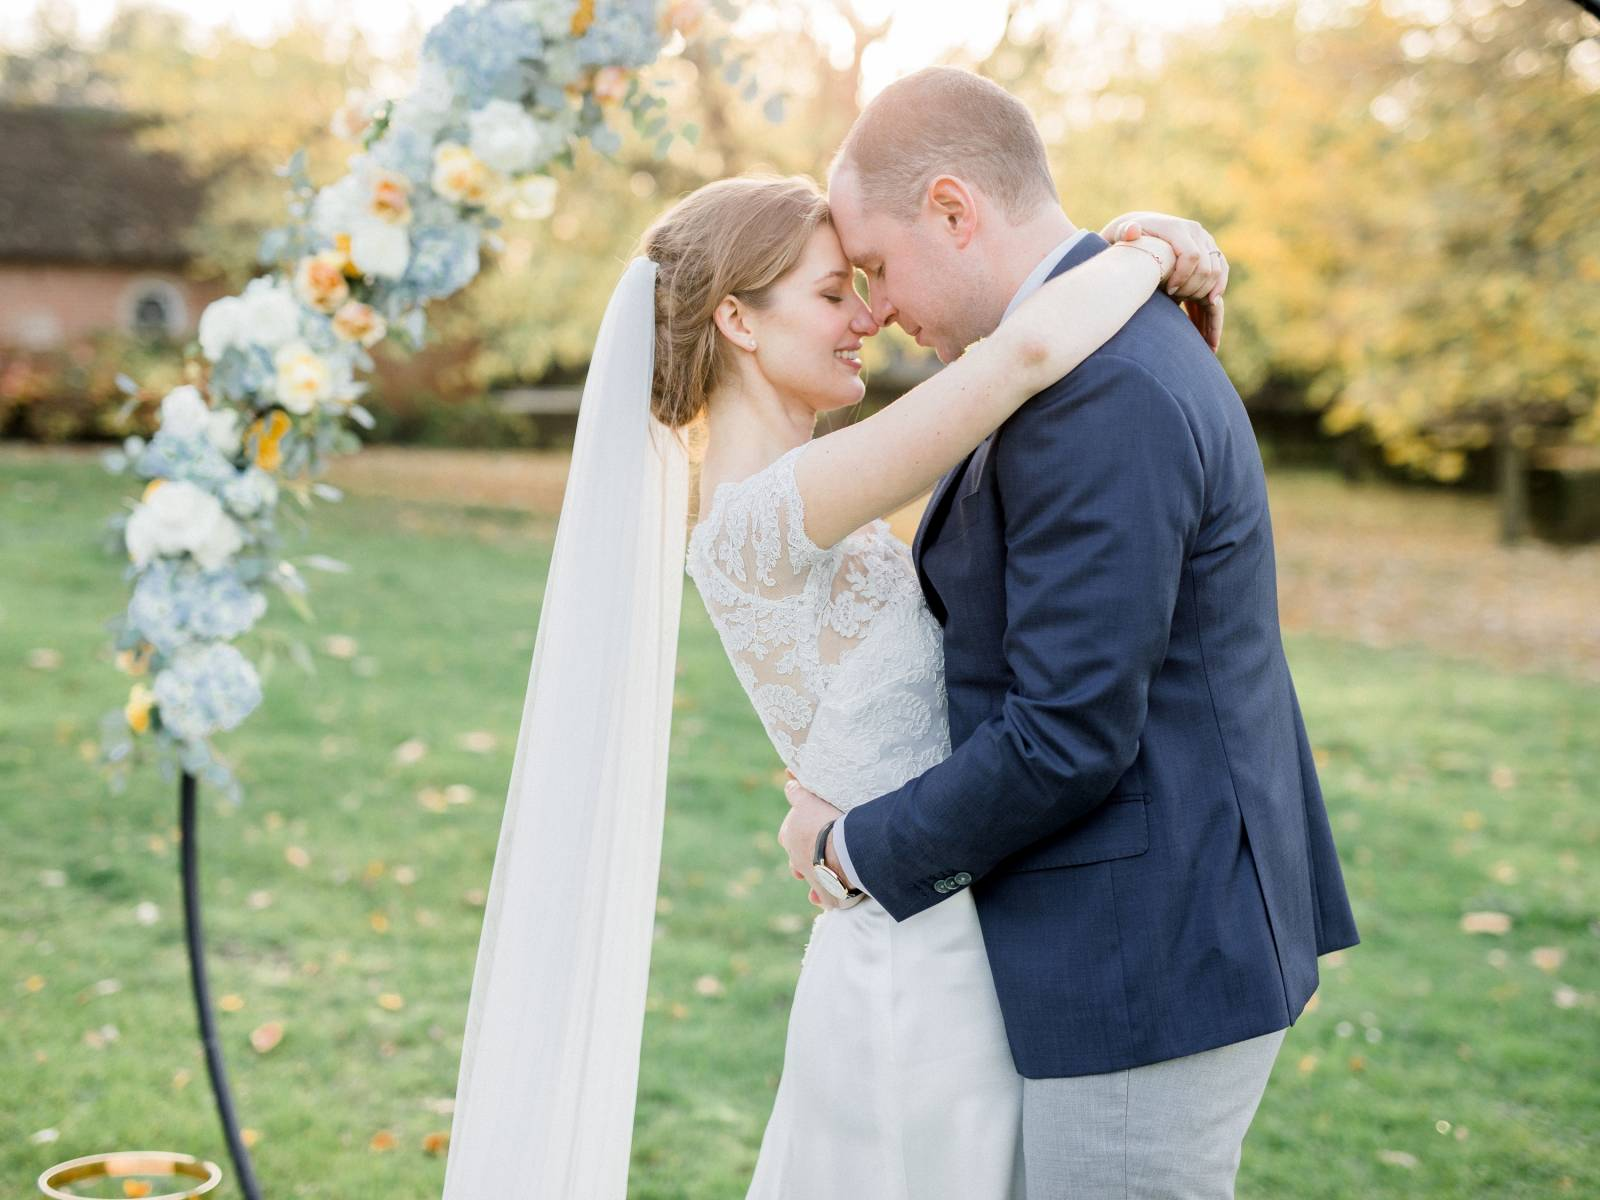 Elisabeth Van Lent Fine Art Wedding Photography - Ferme de Balingue wedding-18